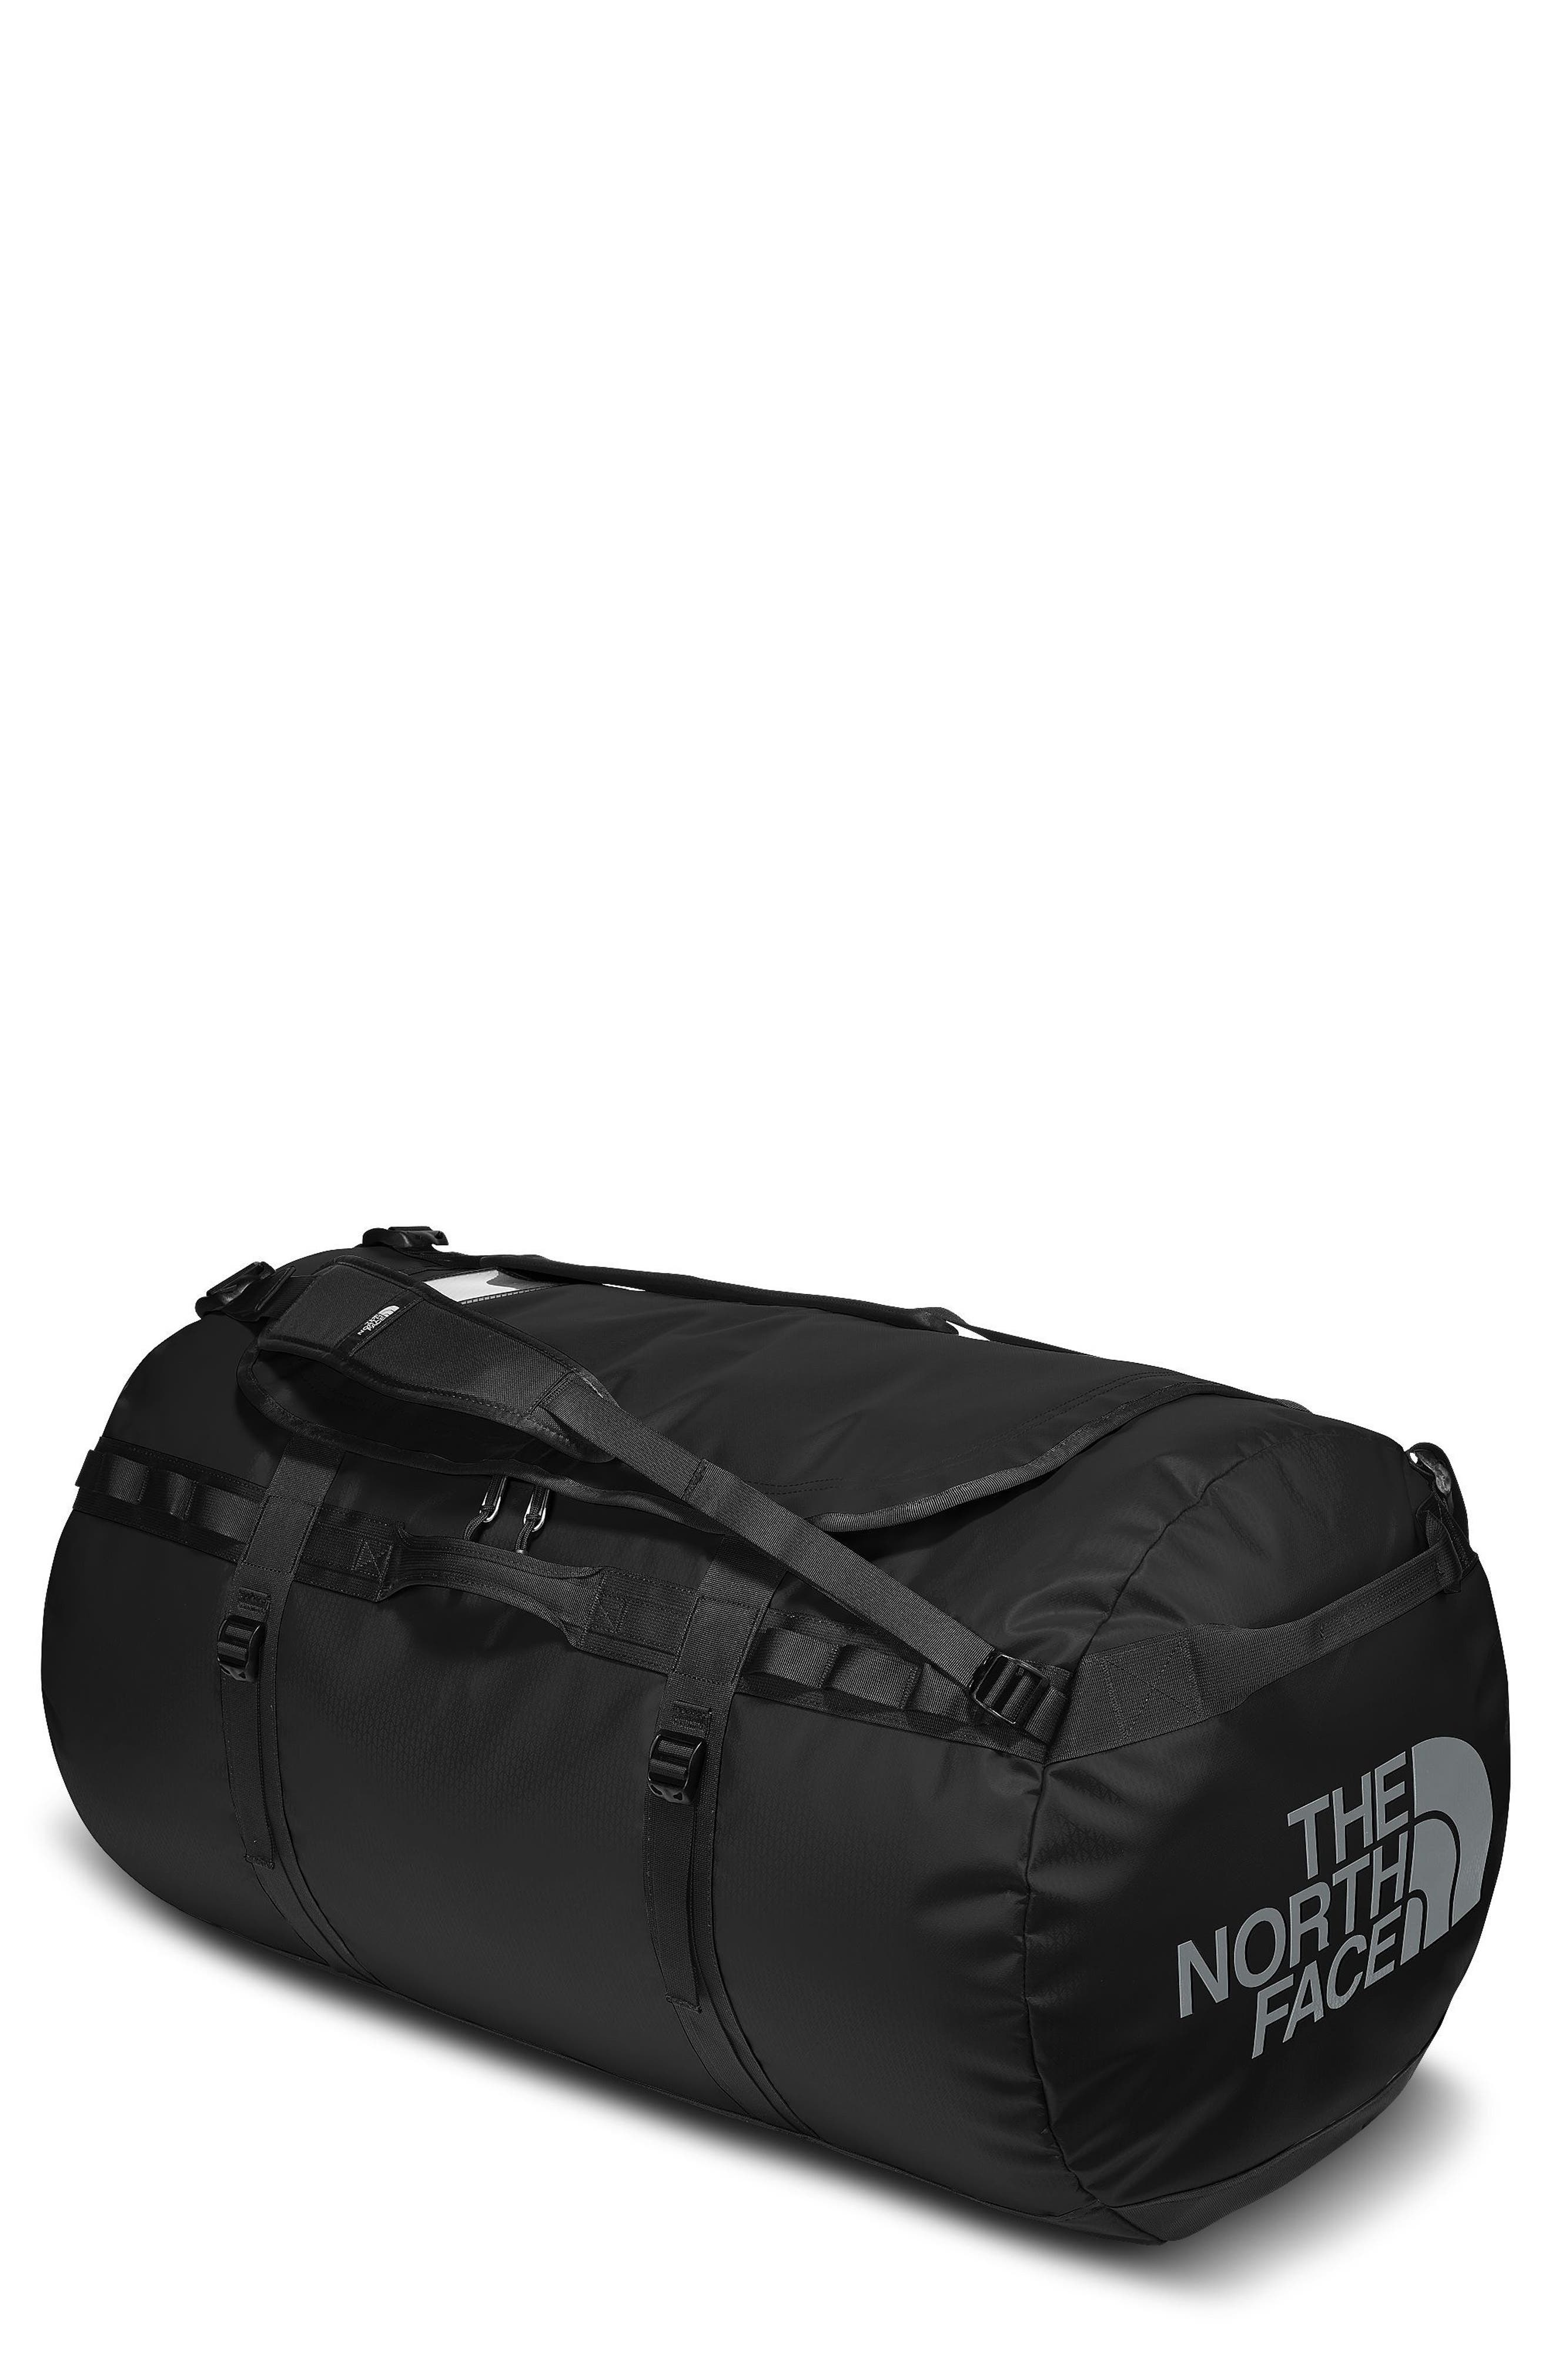 THE NORTH FACE, Base Camp XXL Duffle Bag, Main thumbnail 1, color, TNF BLACK